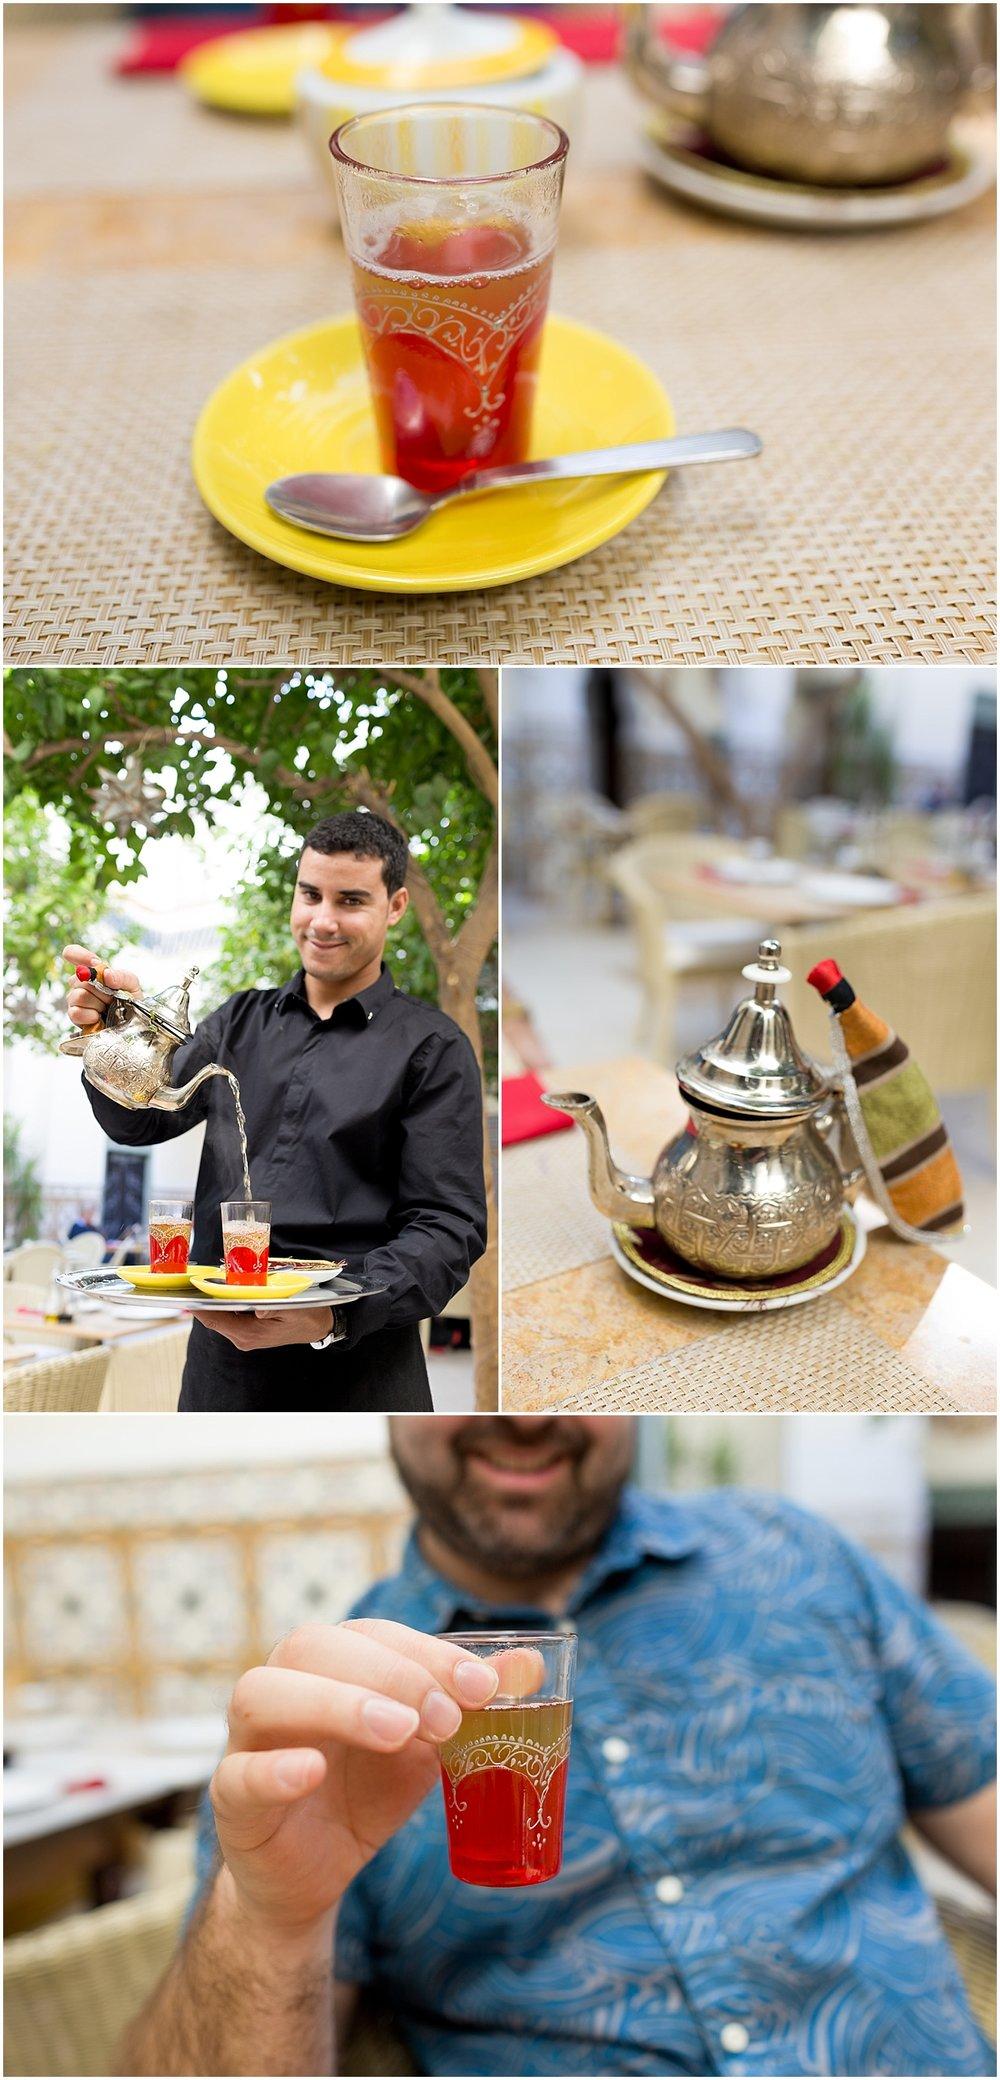 Moroccan mint tea at Marrakech, Morocco restaurant Limoni